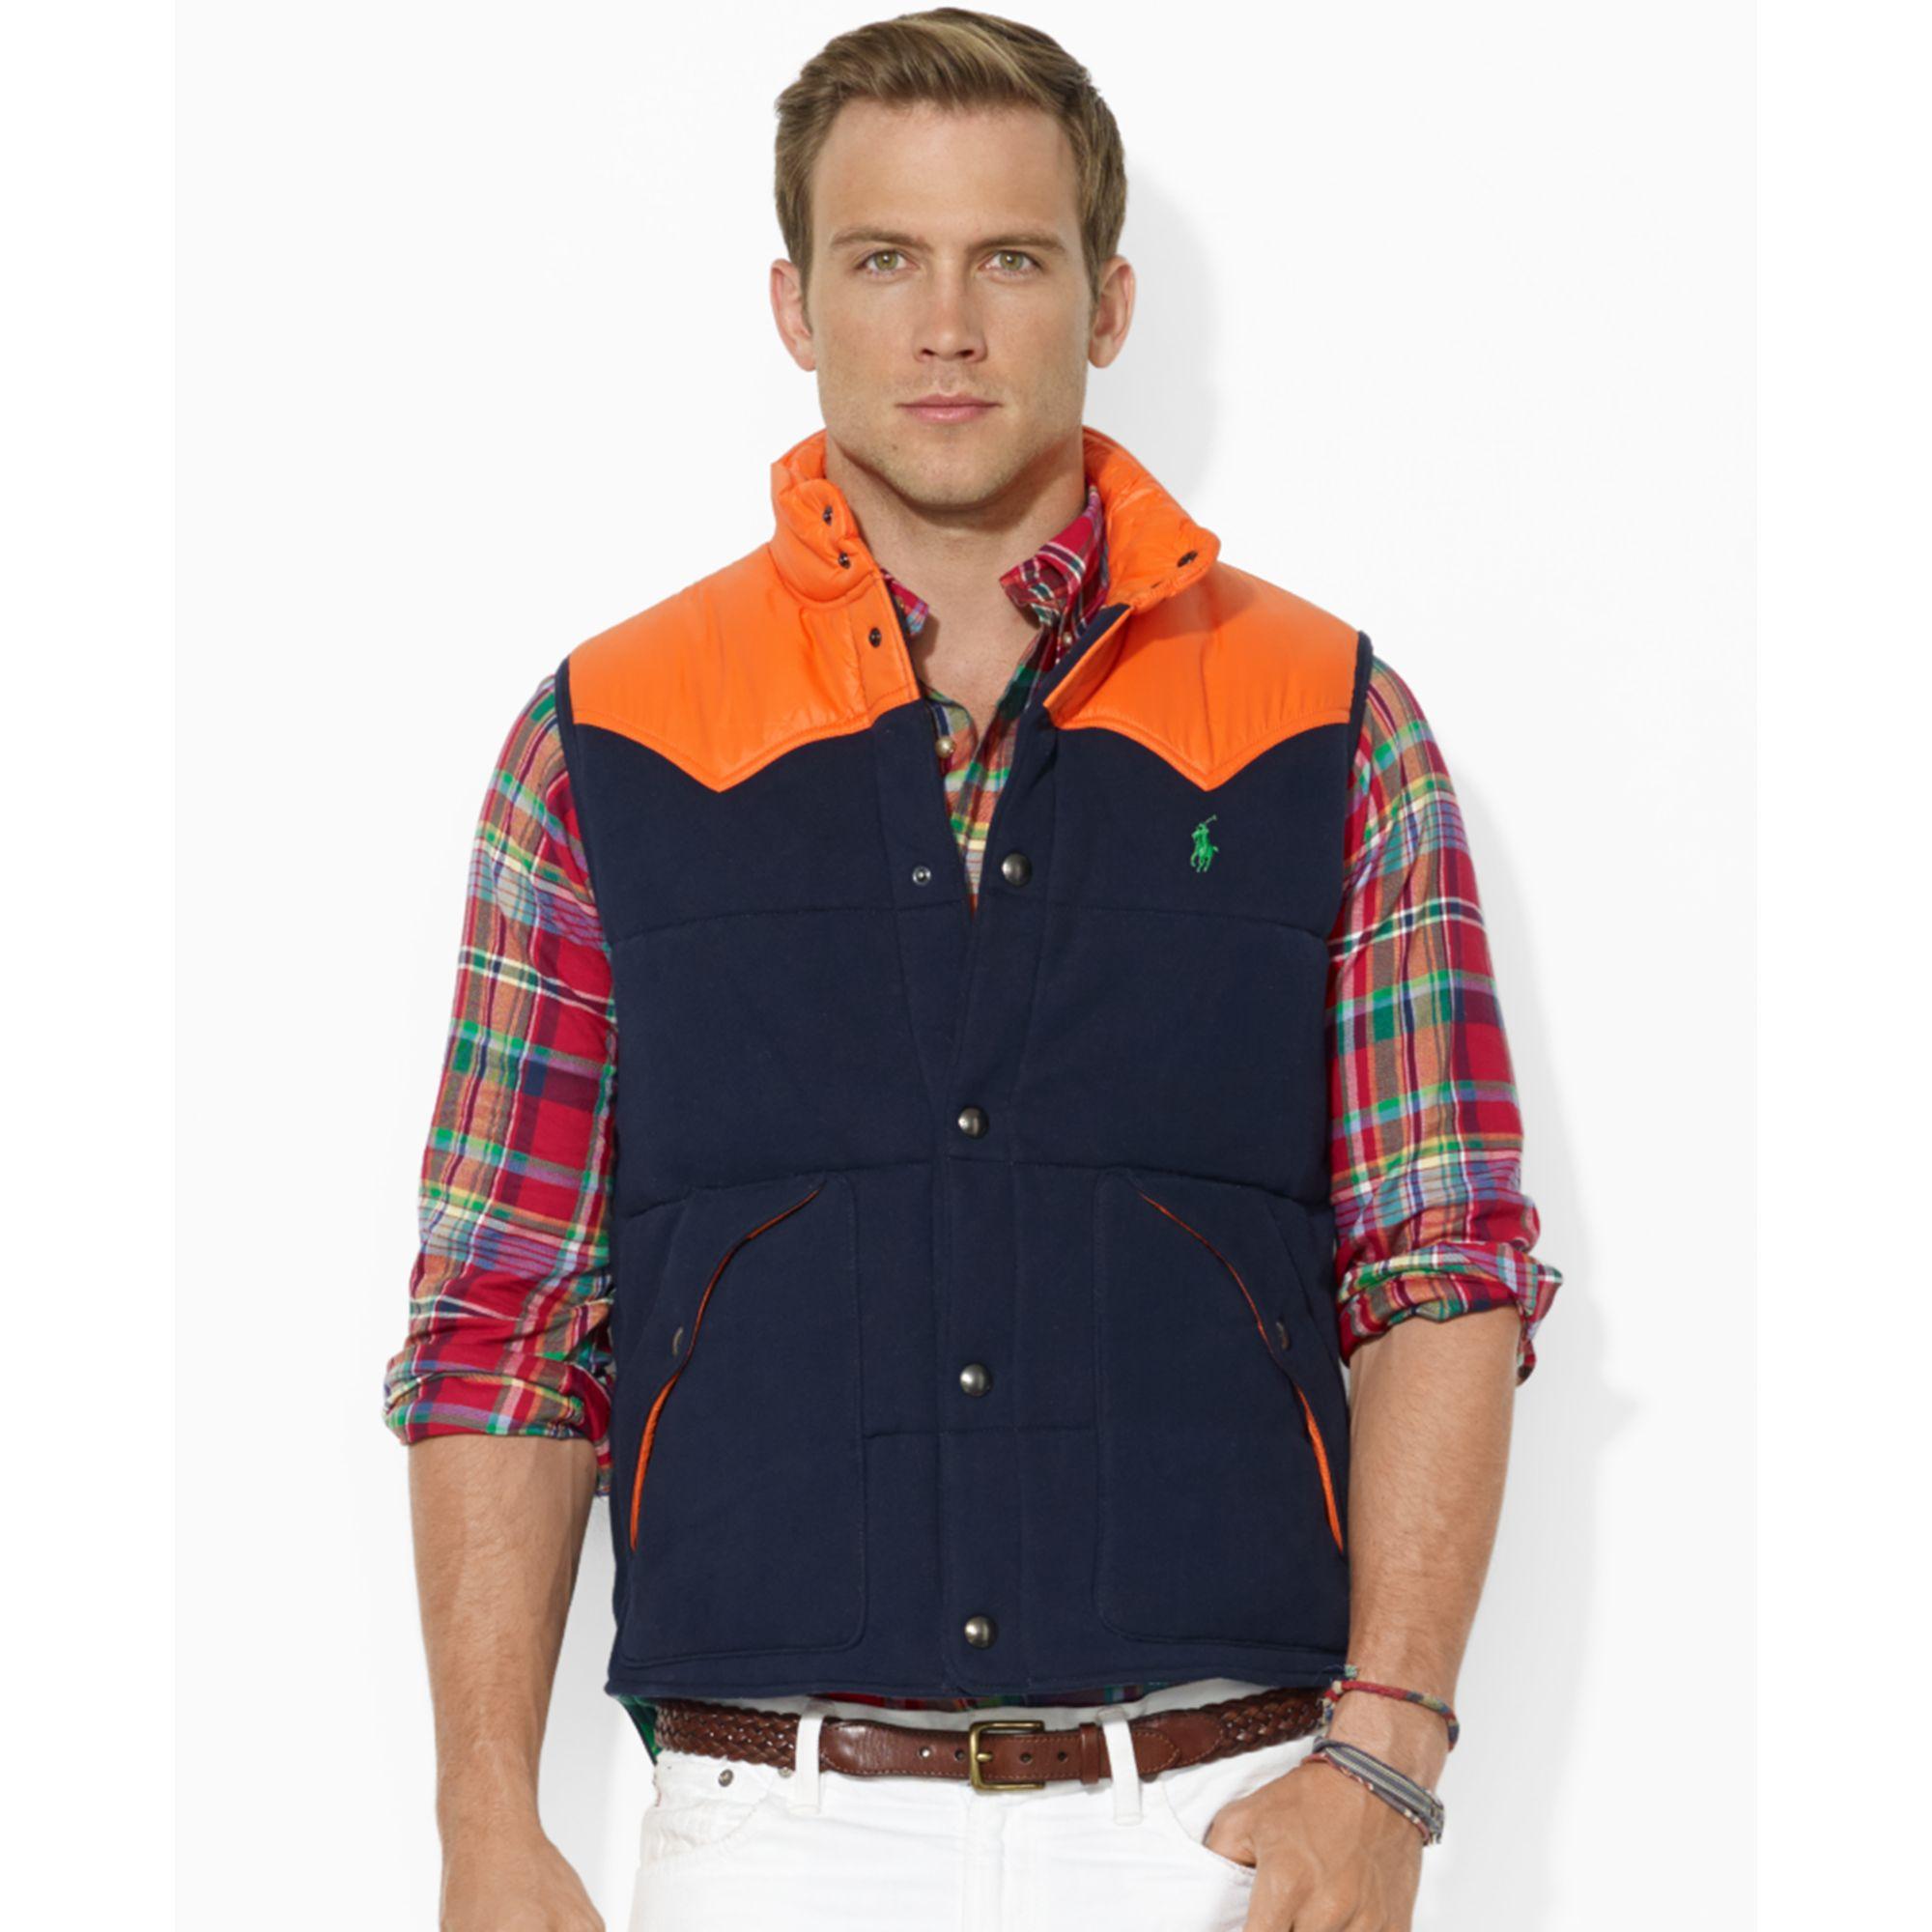 375194de9dde polo ralph lauren vest colorblocked fleece vest - WörterSee Public ...